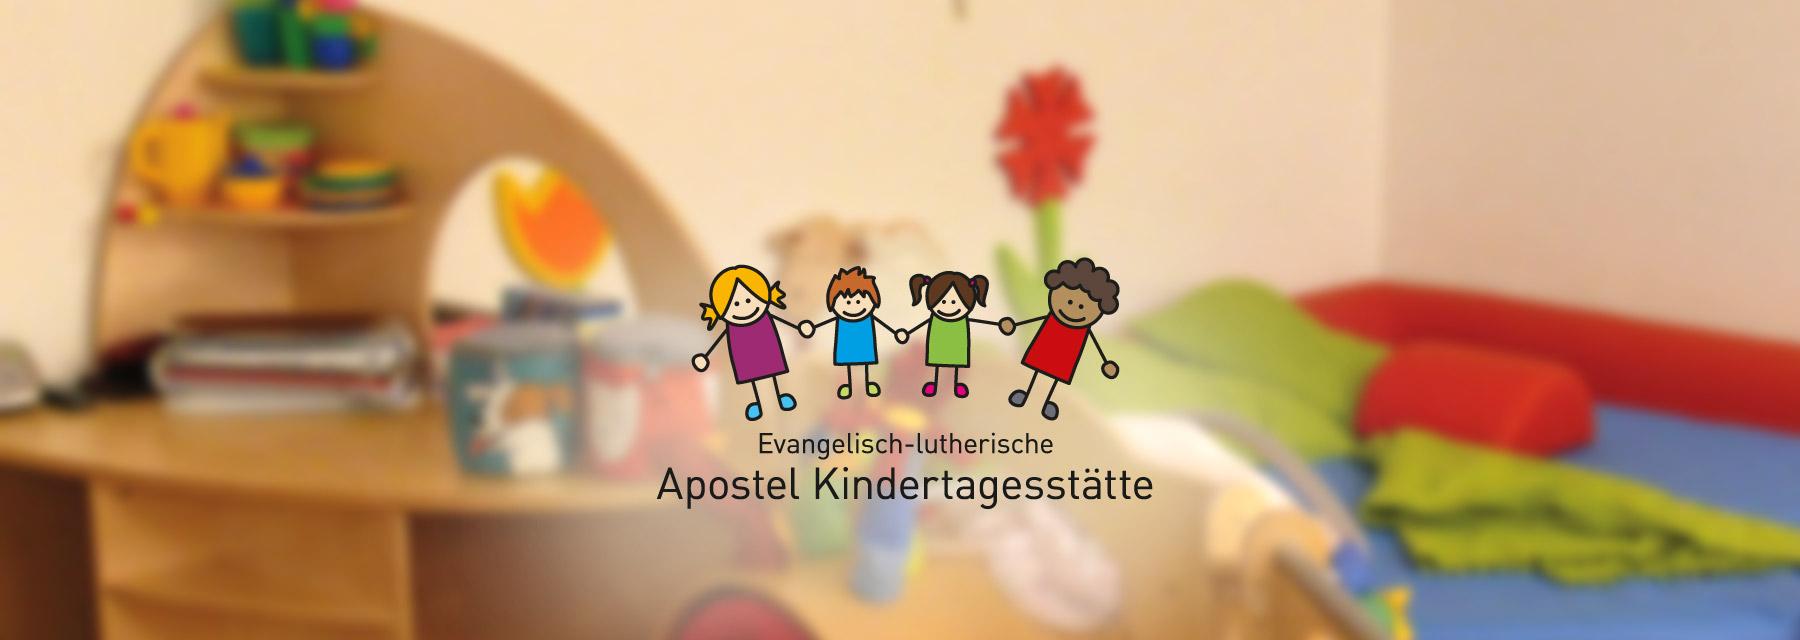 Ev.-luth. Apostel Kindertagesstätte Osnabrück Sutthausen